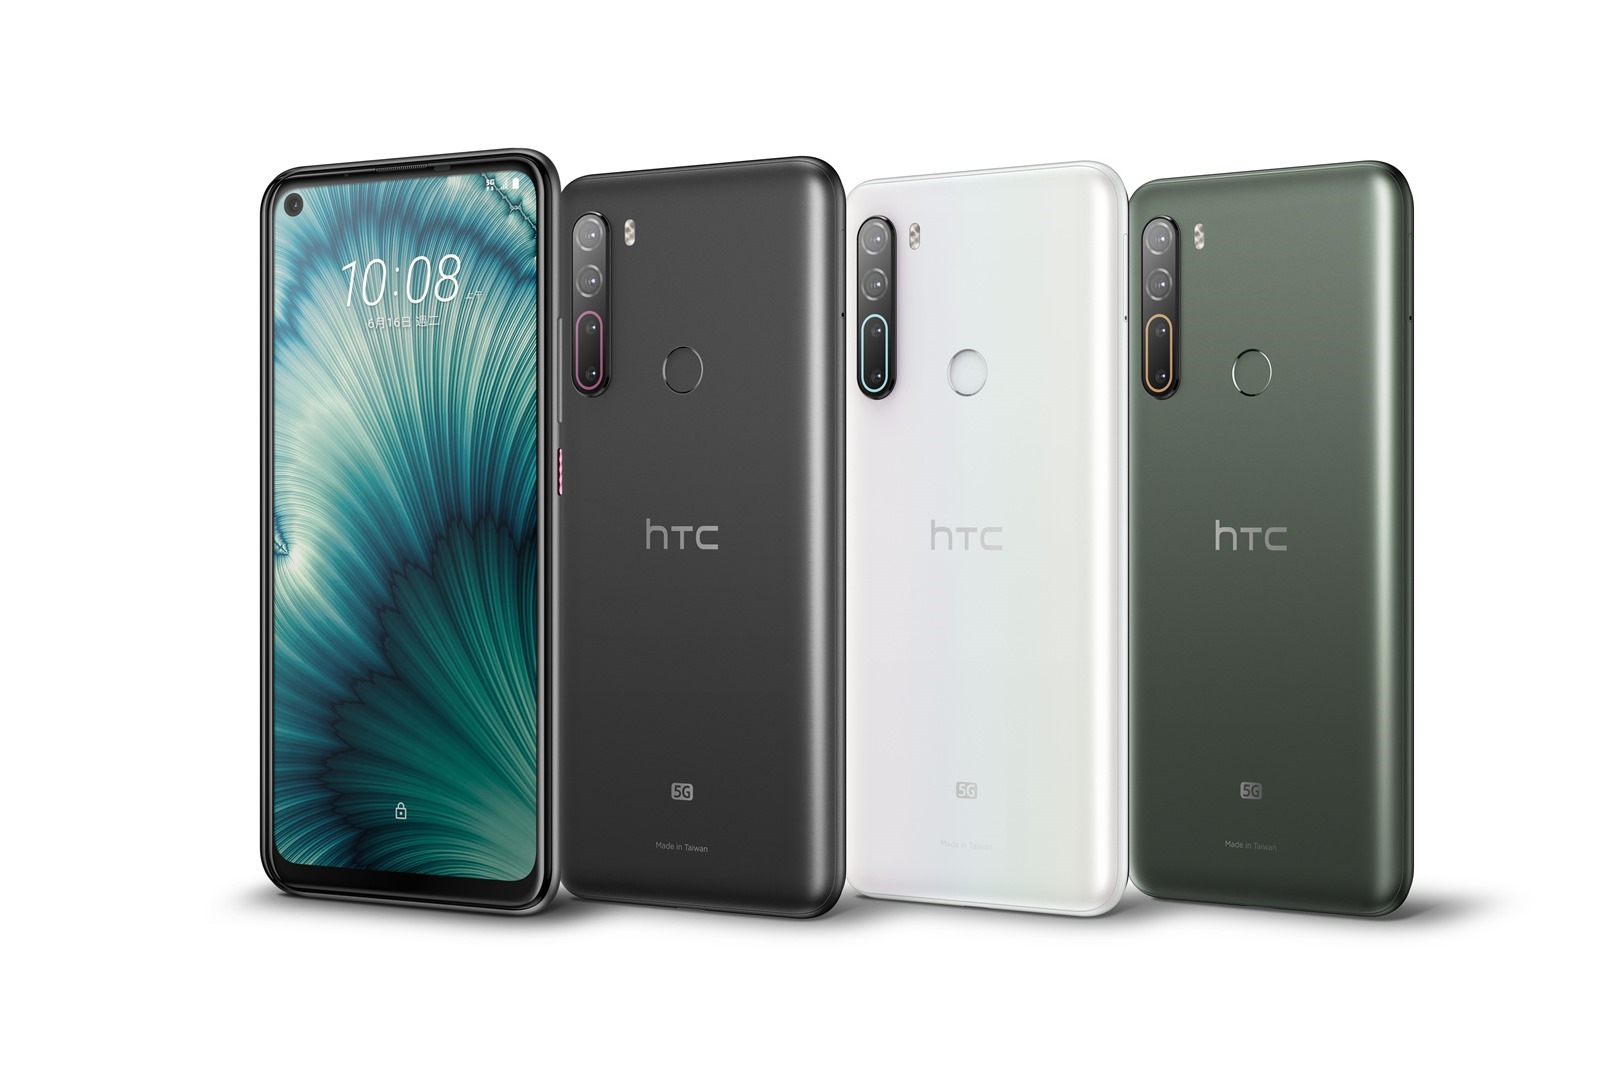 HTC 春季購物節開跑 4 月 1 日起 U20 5G 狂降 5,000 元 @3C 達人廖阿輝